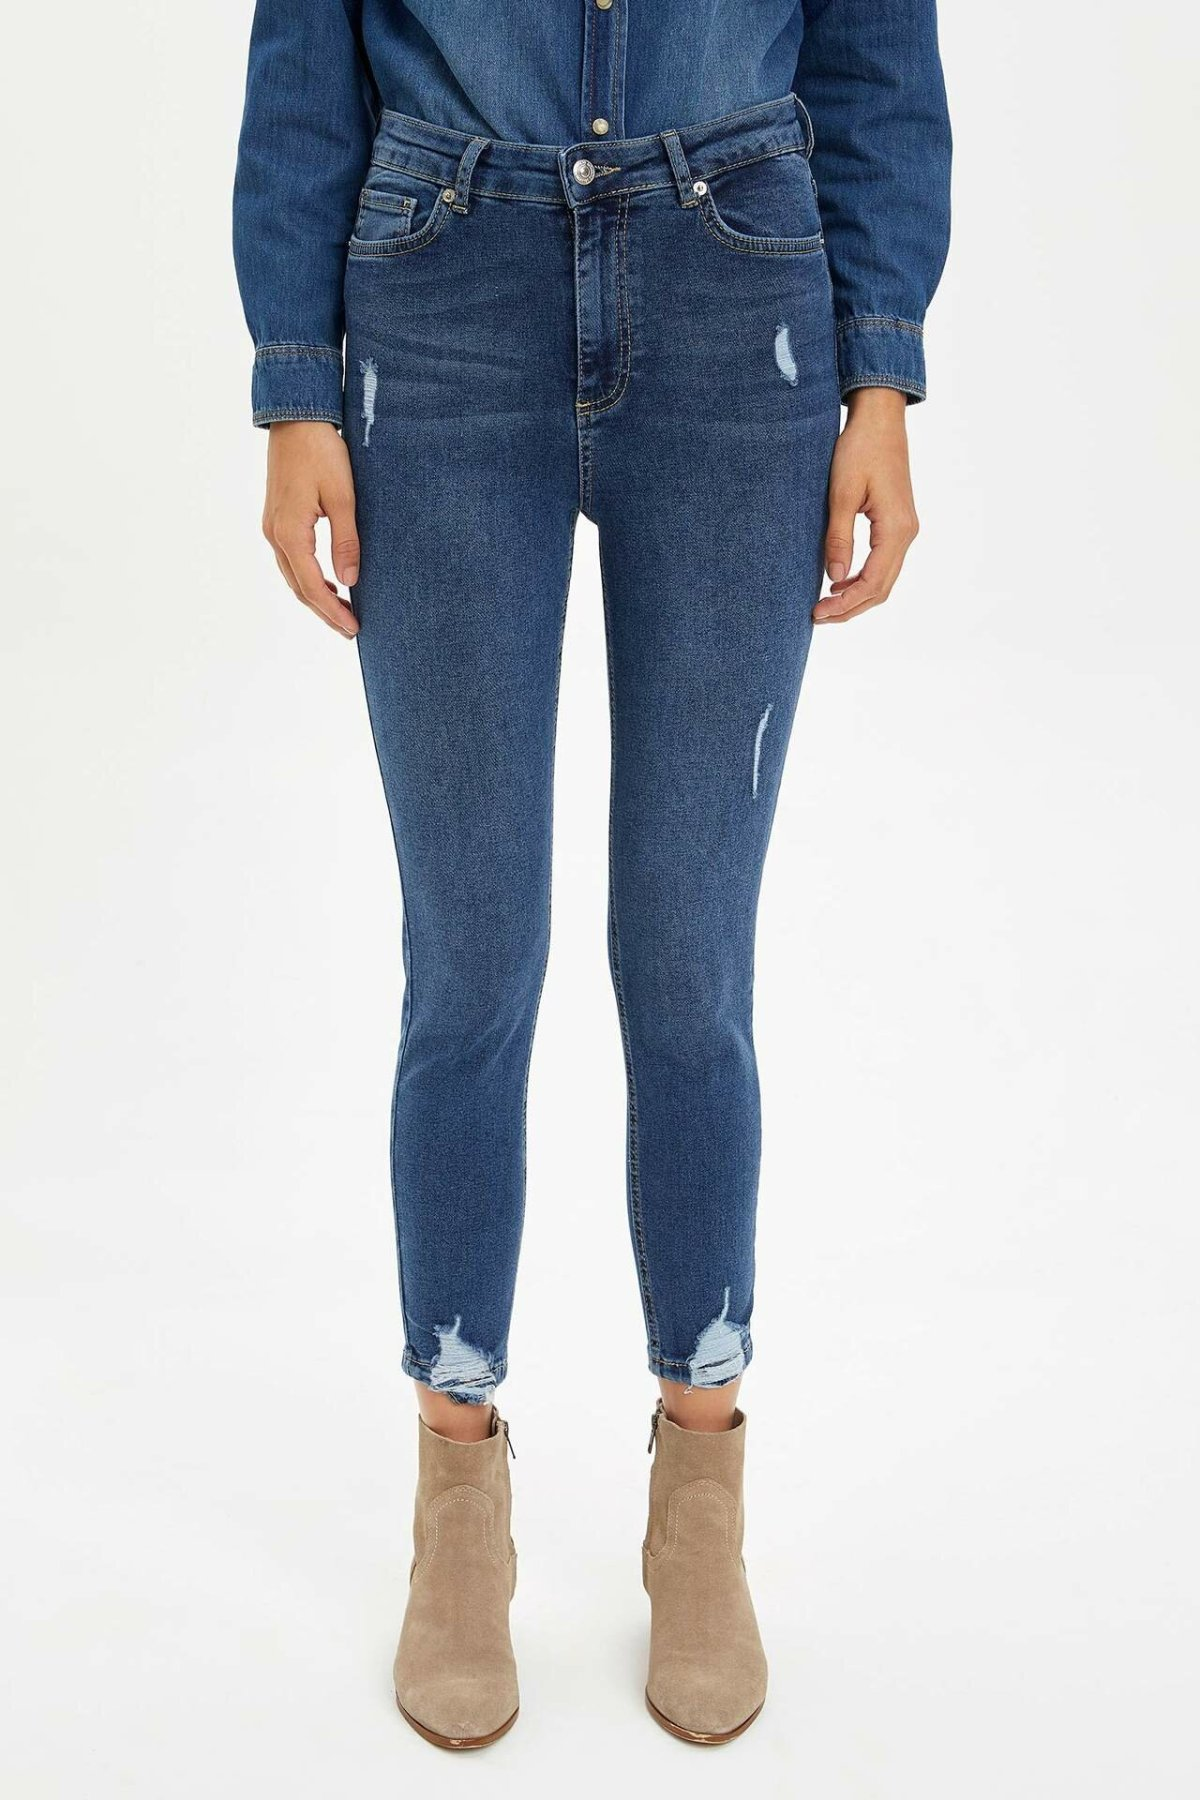 DeFacto Woman Fashion Pencil Trousers Female Casual Mid-waist Skinny Jeans High Quality Joker Pants New - M9521AZ19WN